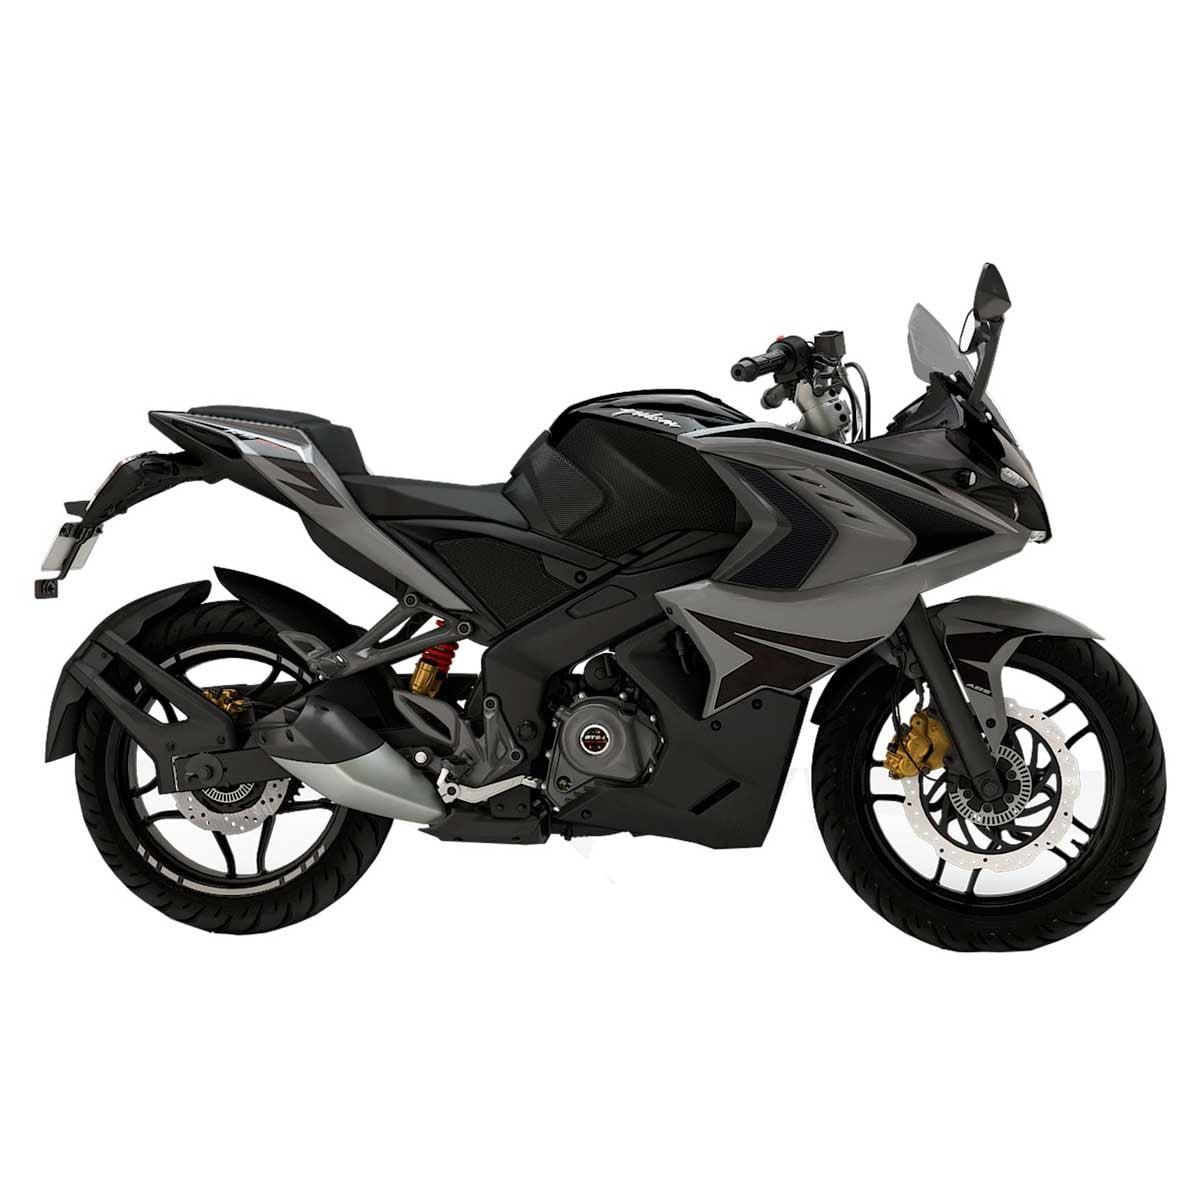 Motocicleta Pulsar Rs 200 Cc Negra Bajaj